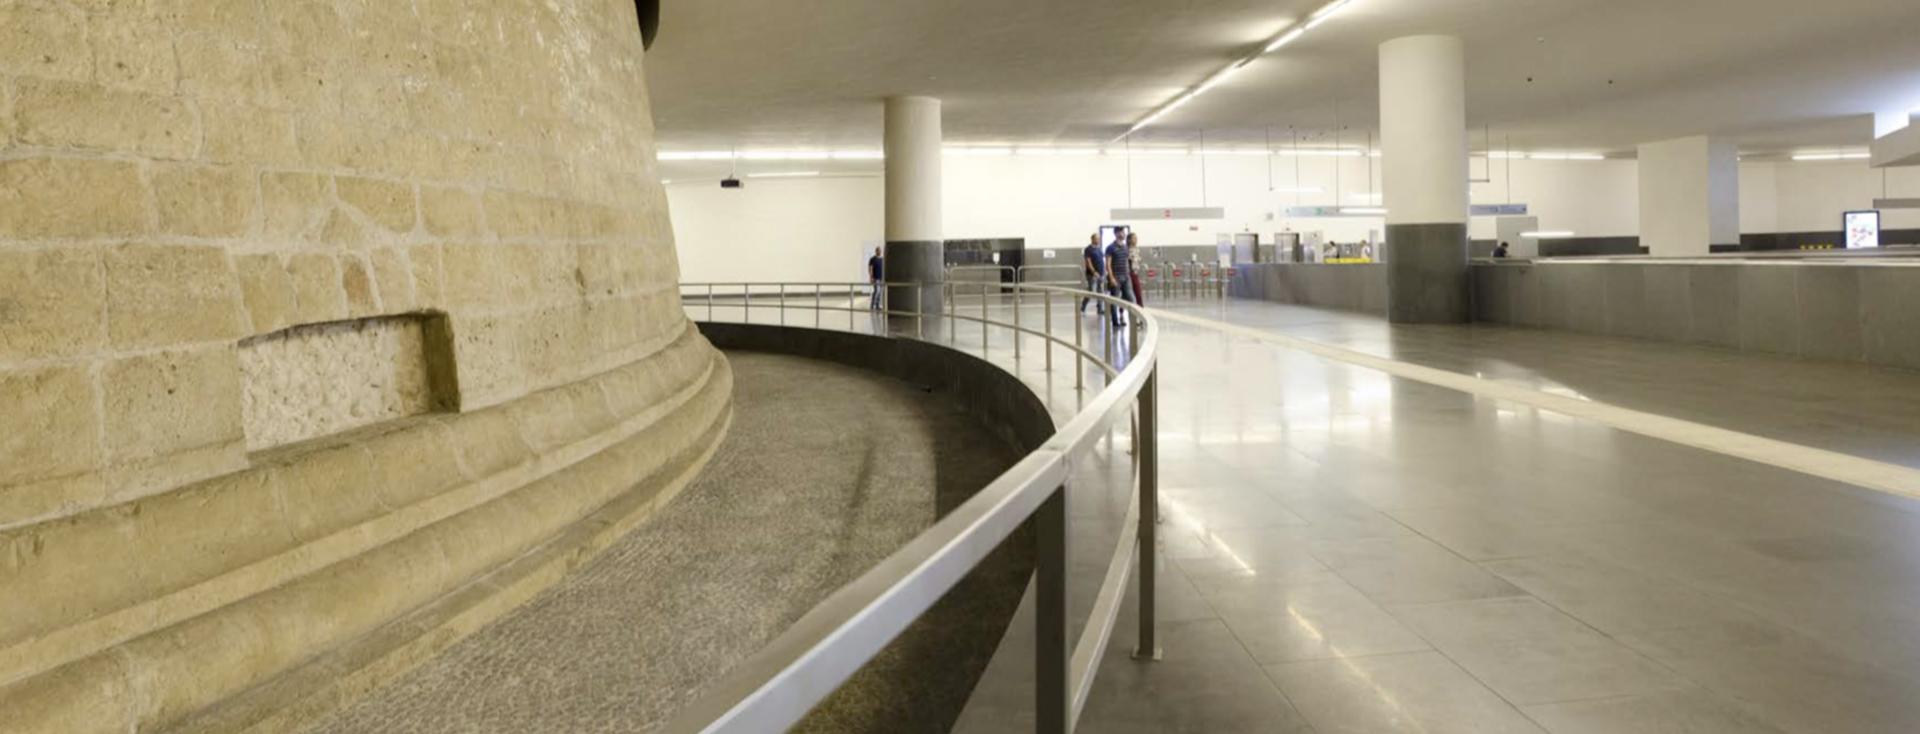 linea 1 - stazione municipio - metropolitana